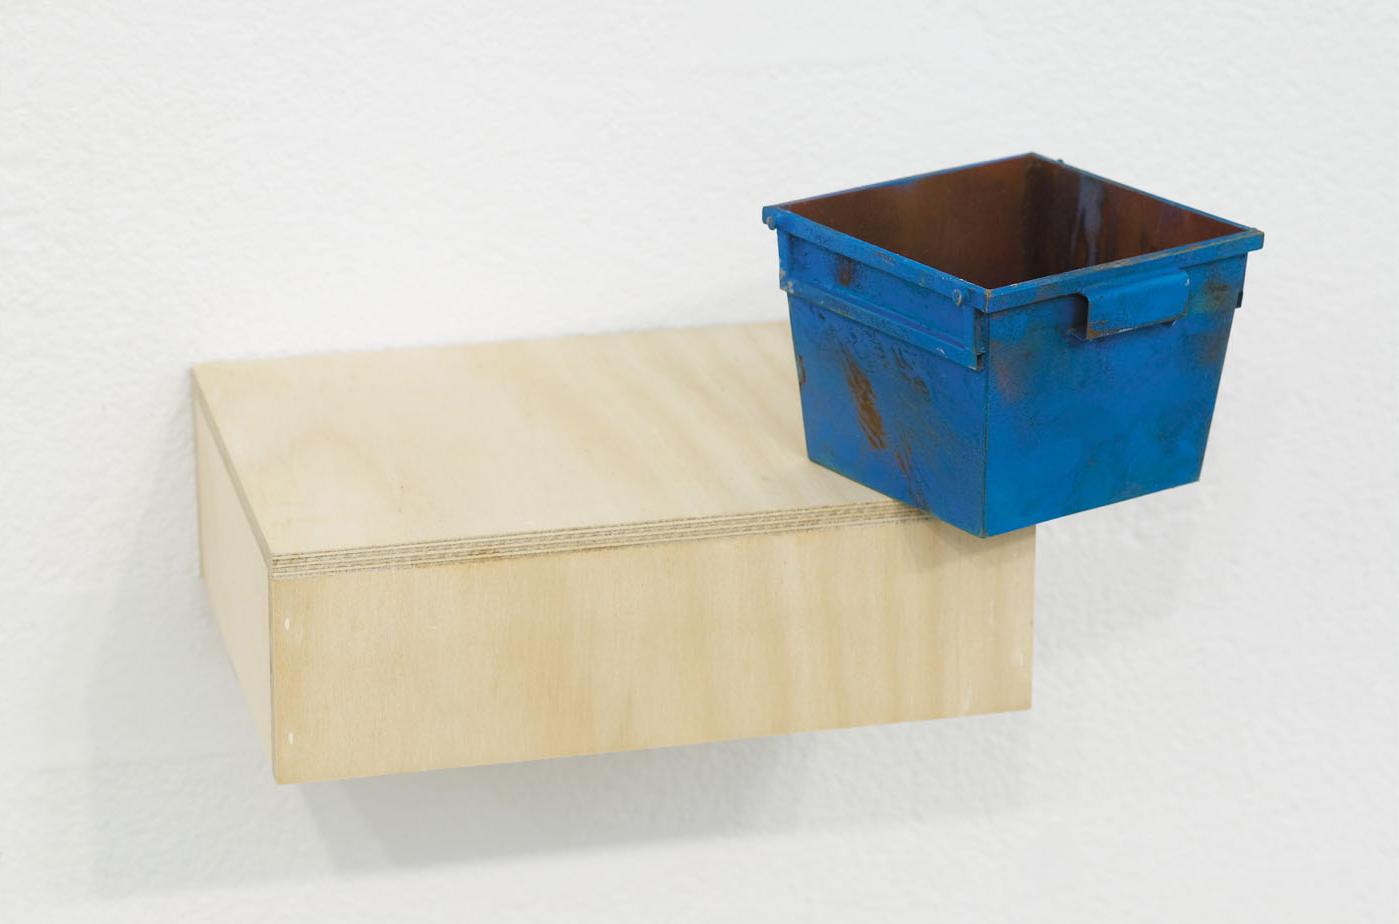 22. EDGE Enamel on Steel & Brass, Plywood,Magnet 18 x 33 x 27 cm